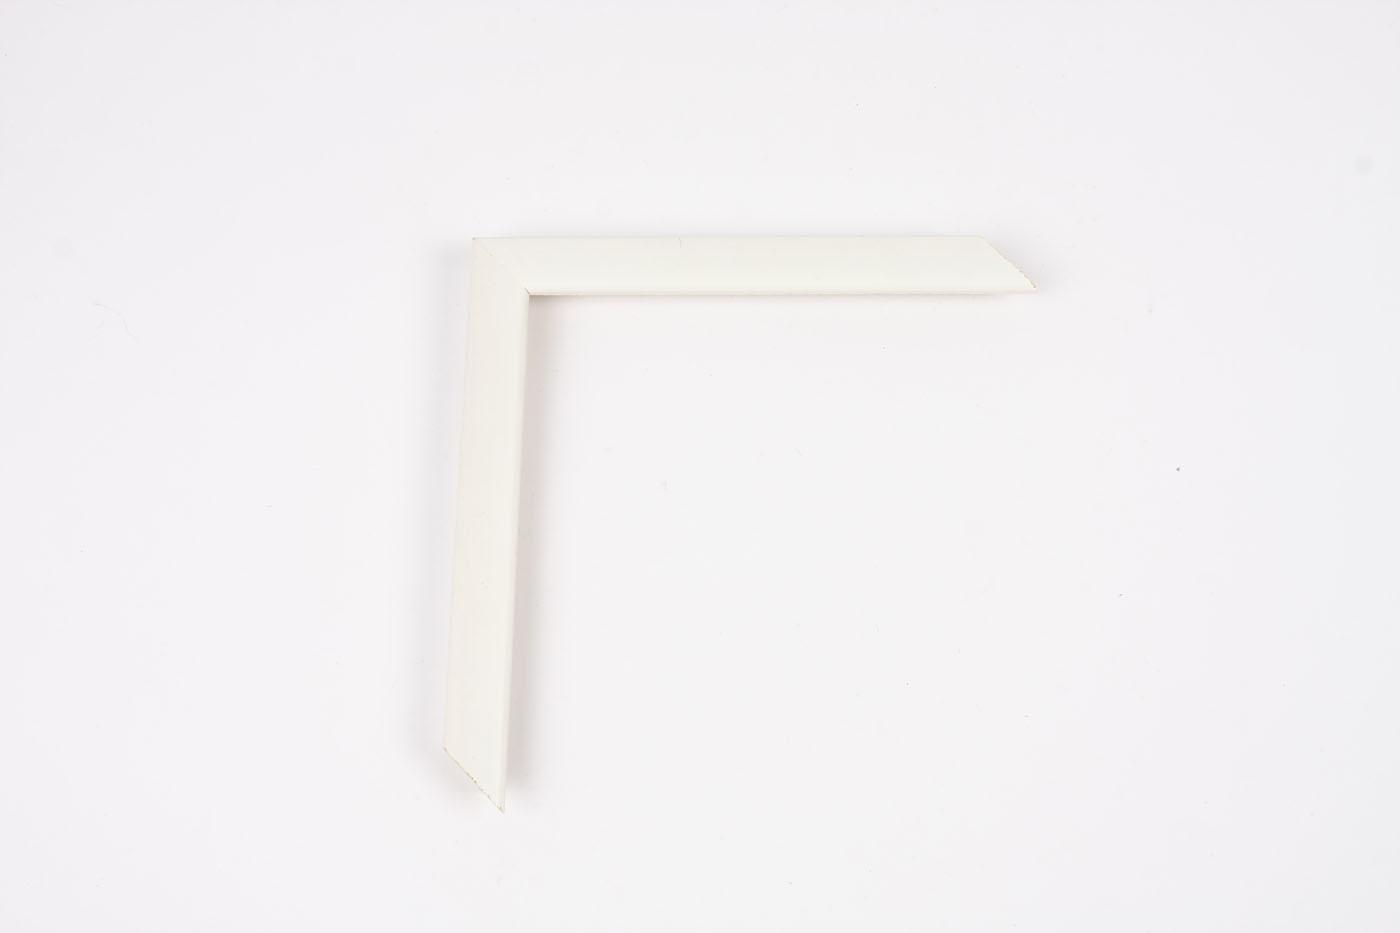 00290-100-BLAN-ancho1,8cm